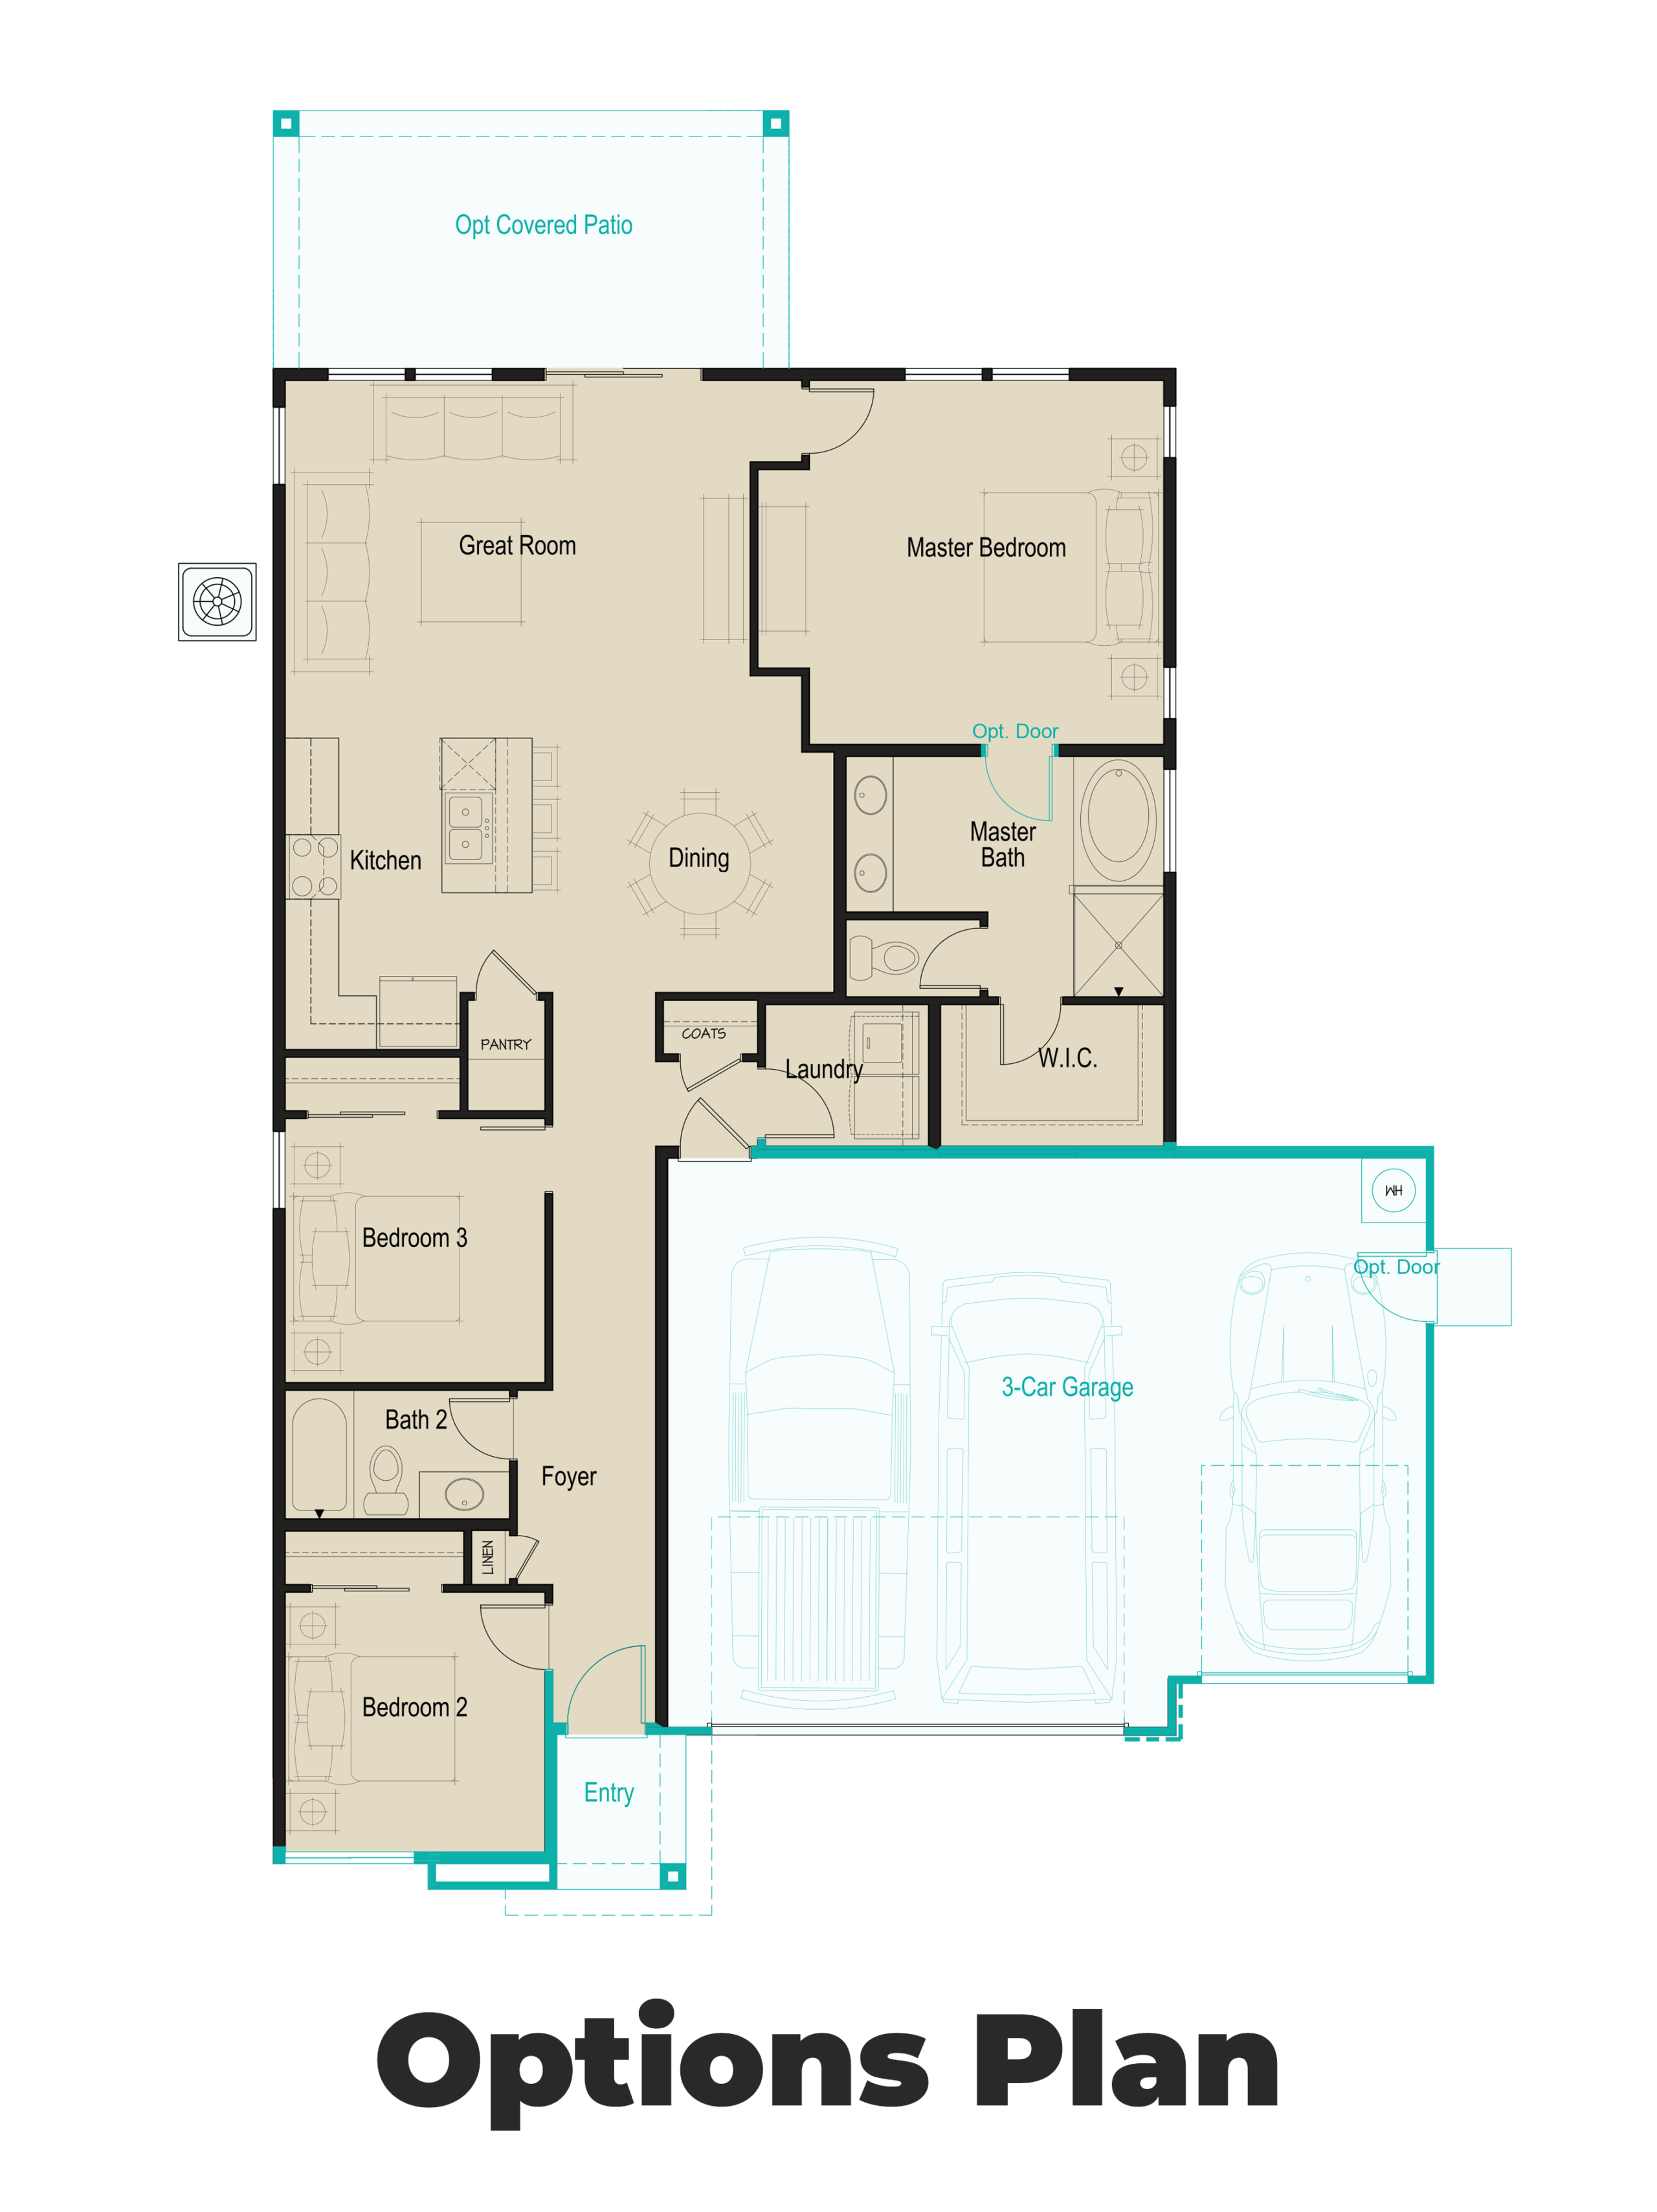 new-homes-golden-valley-estancia-floorplan1-1469-options